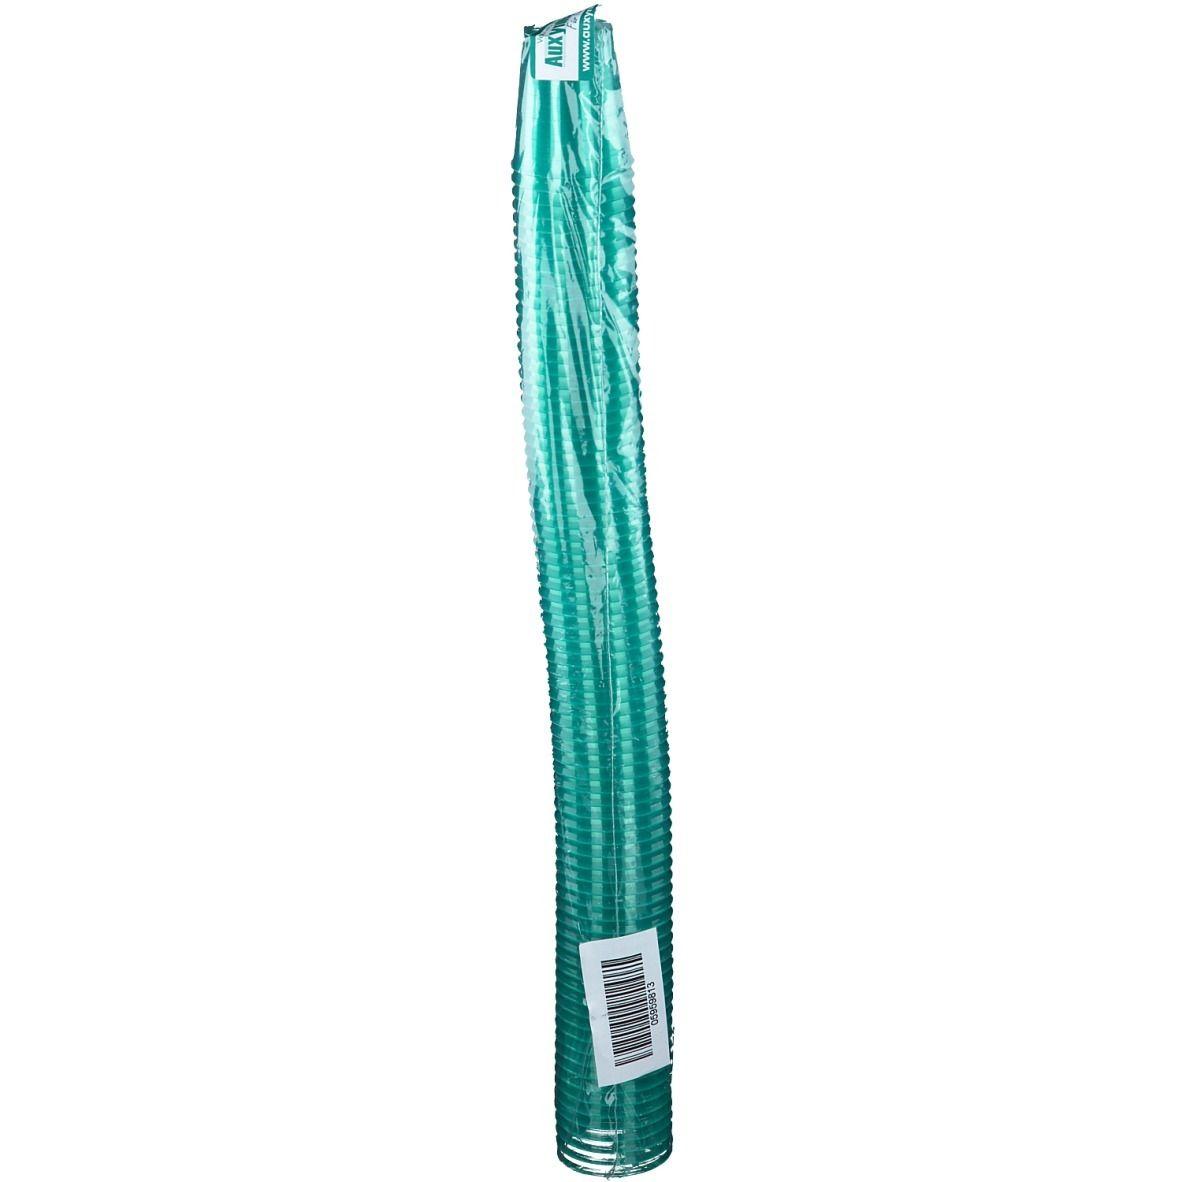 Image of Medizinbecher 30 ml grün